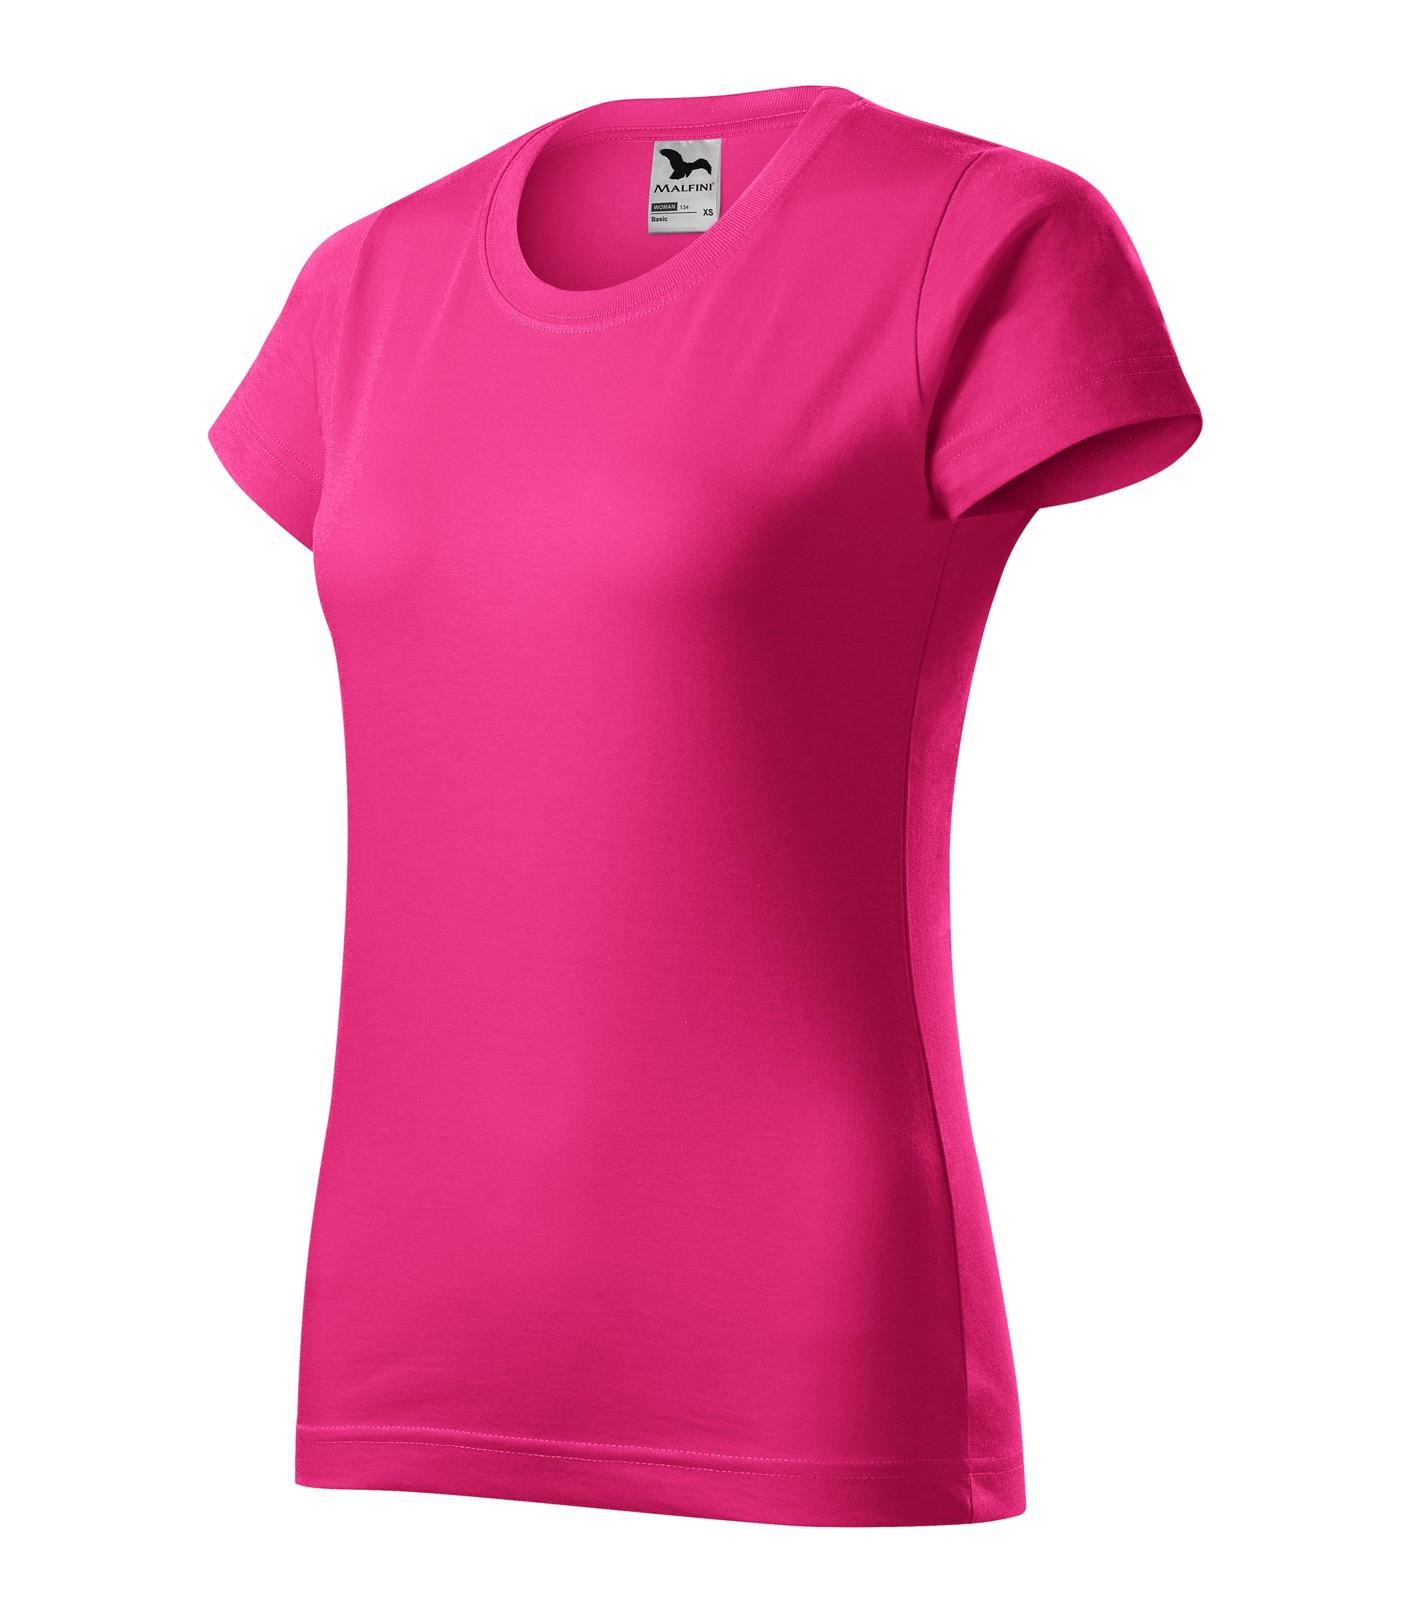 Tričko dámské Malfini Basic - Purpurová / M